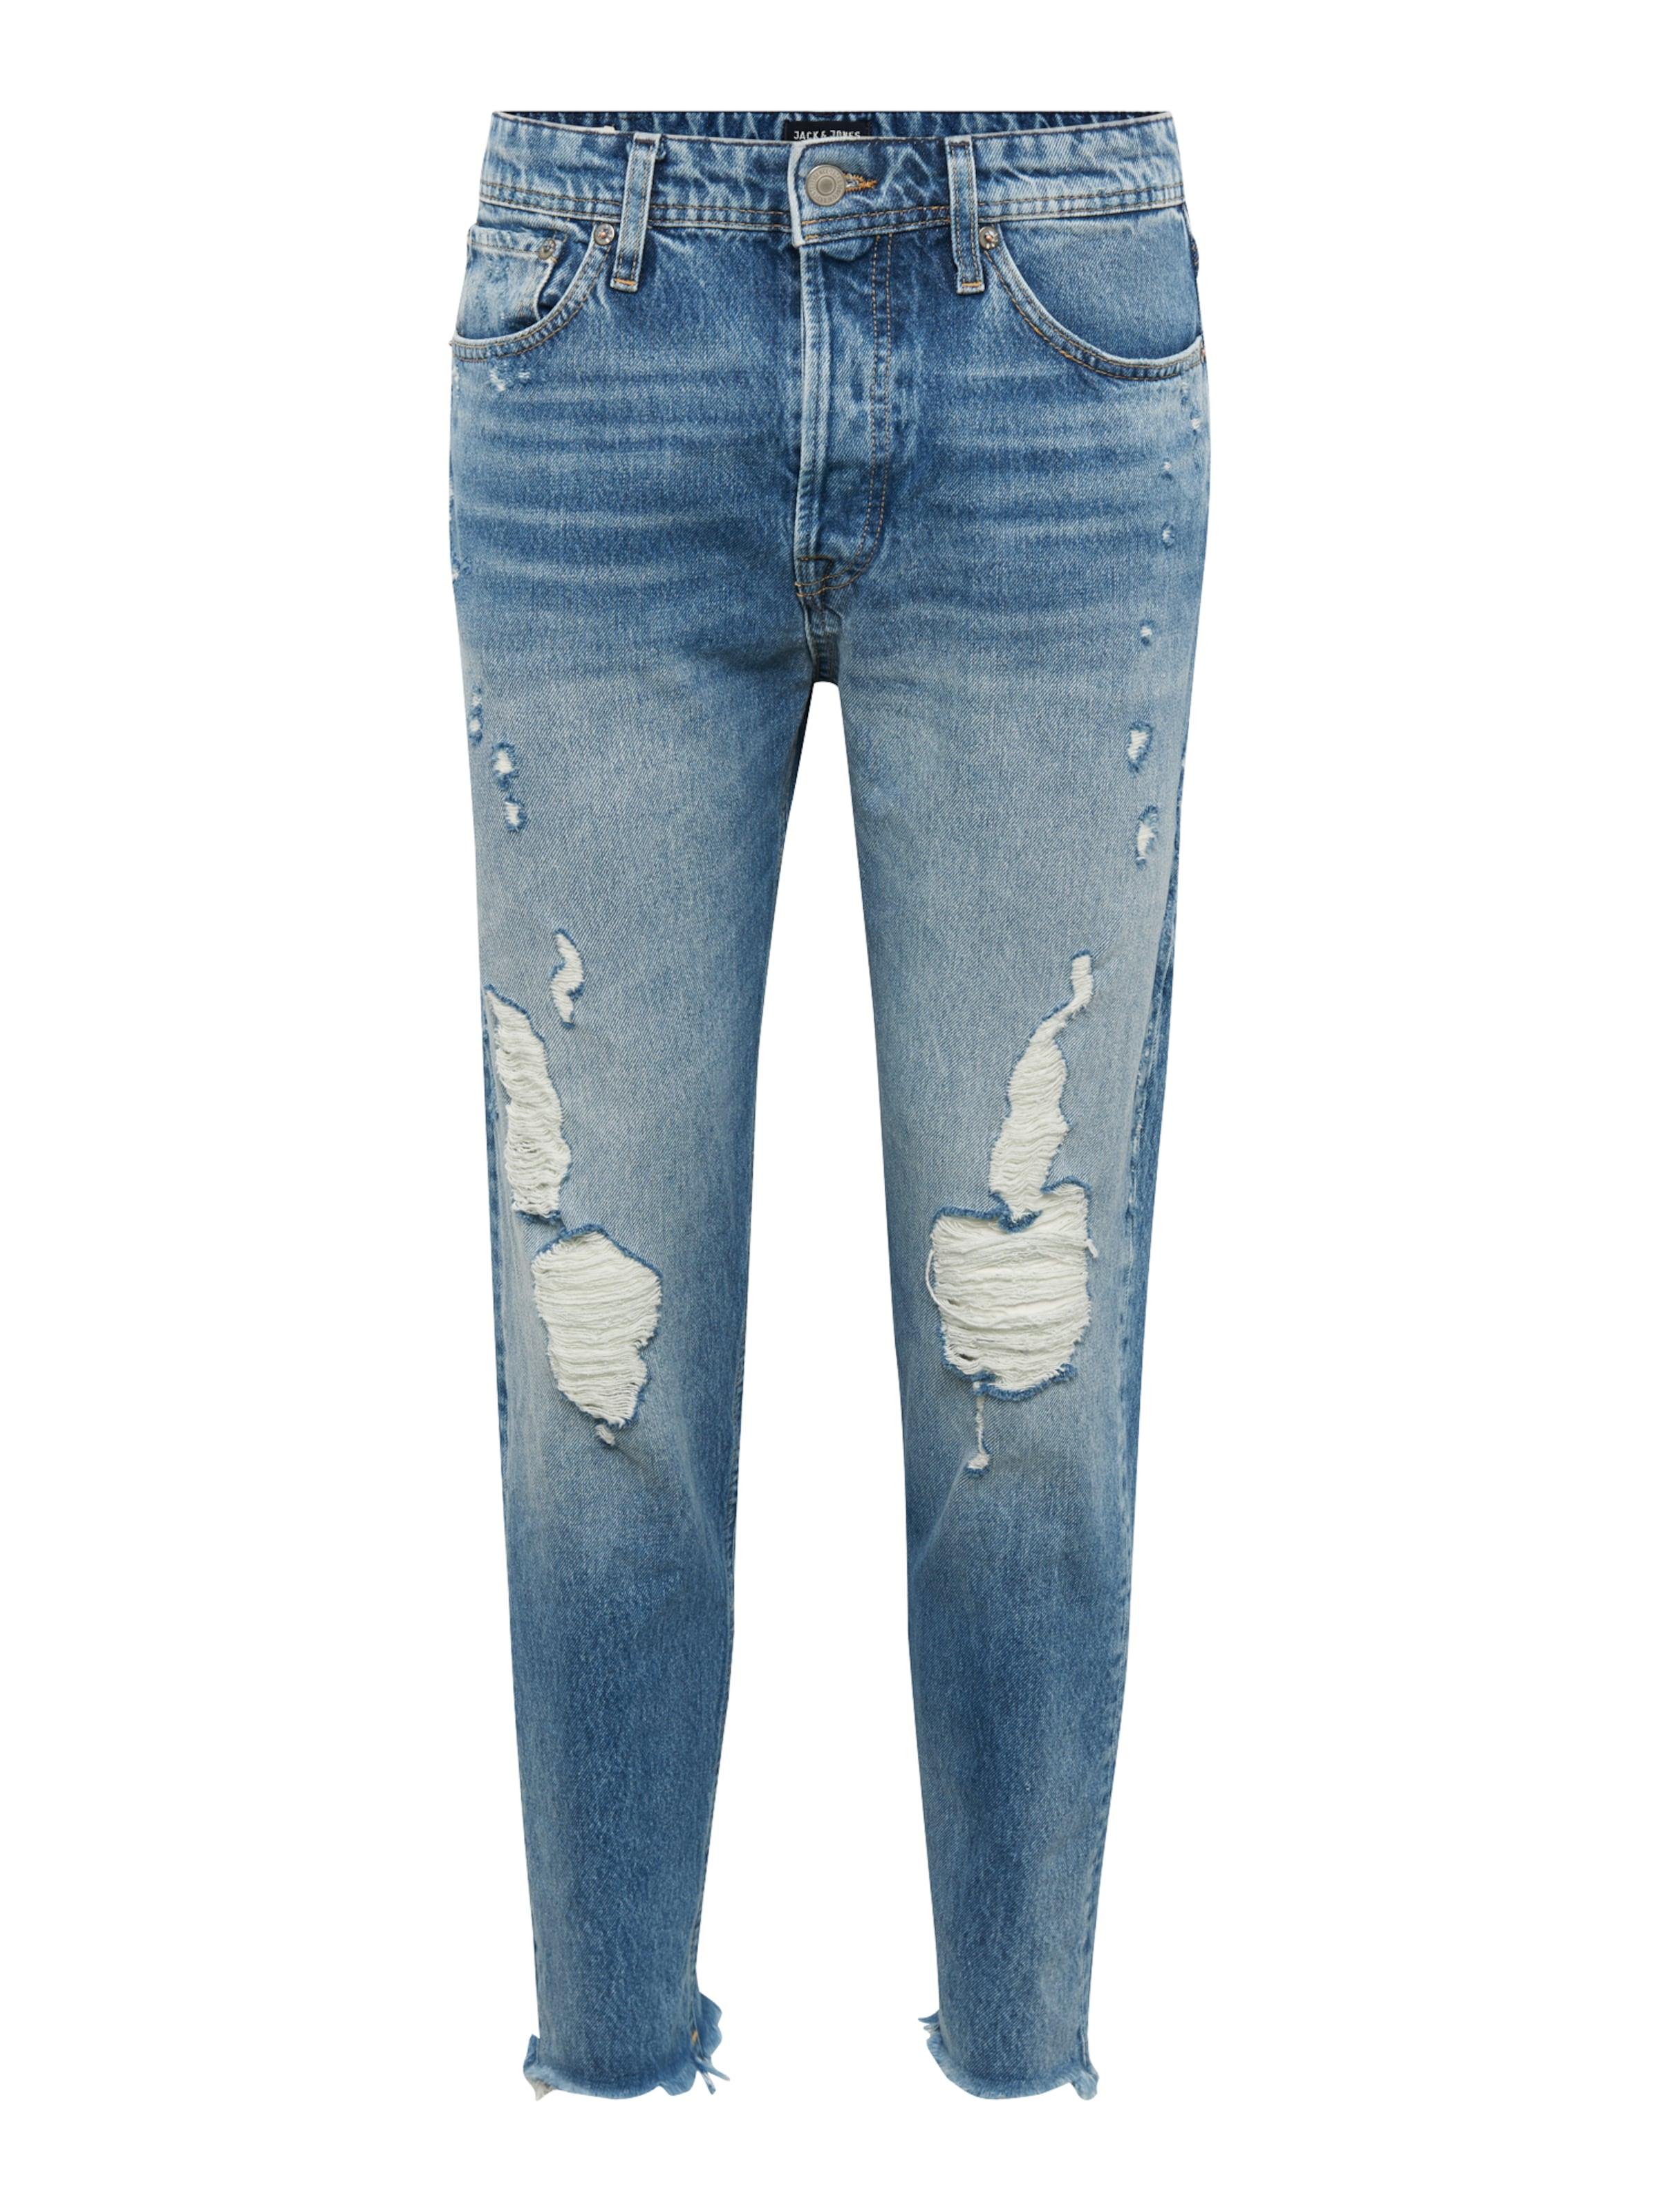 Jeans Jones Blue Denim Jackamp; Jjoriginal 'jjifred 065 Sts' Jj In 6yvIYb7gmf